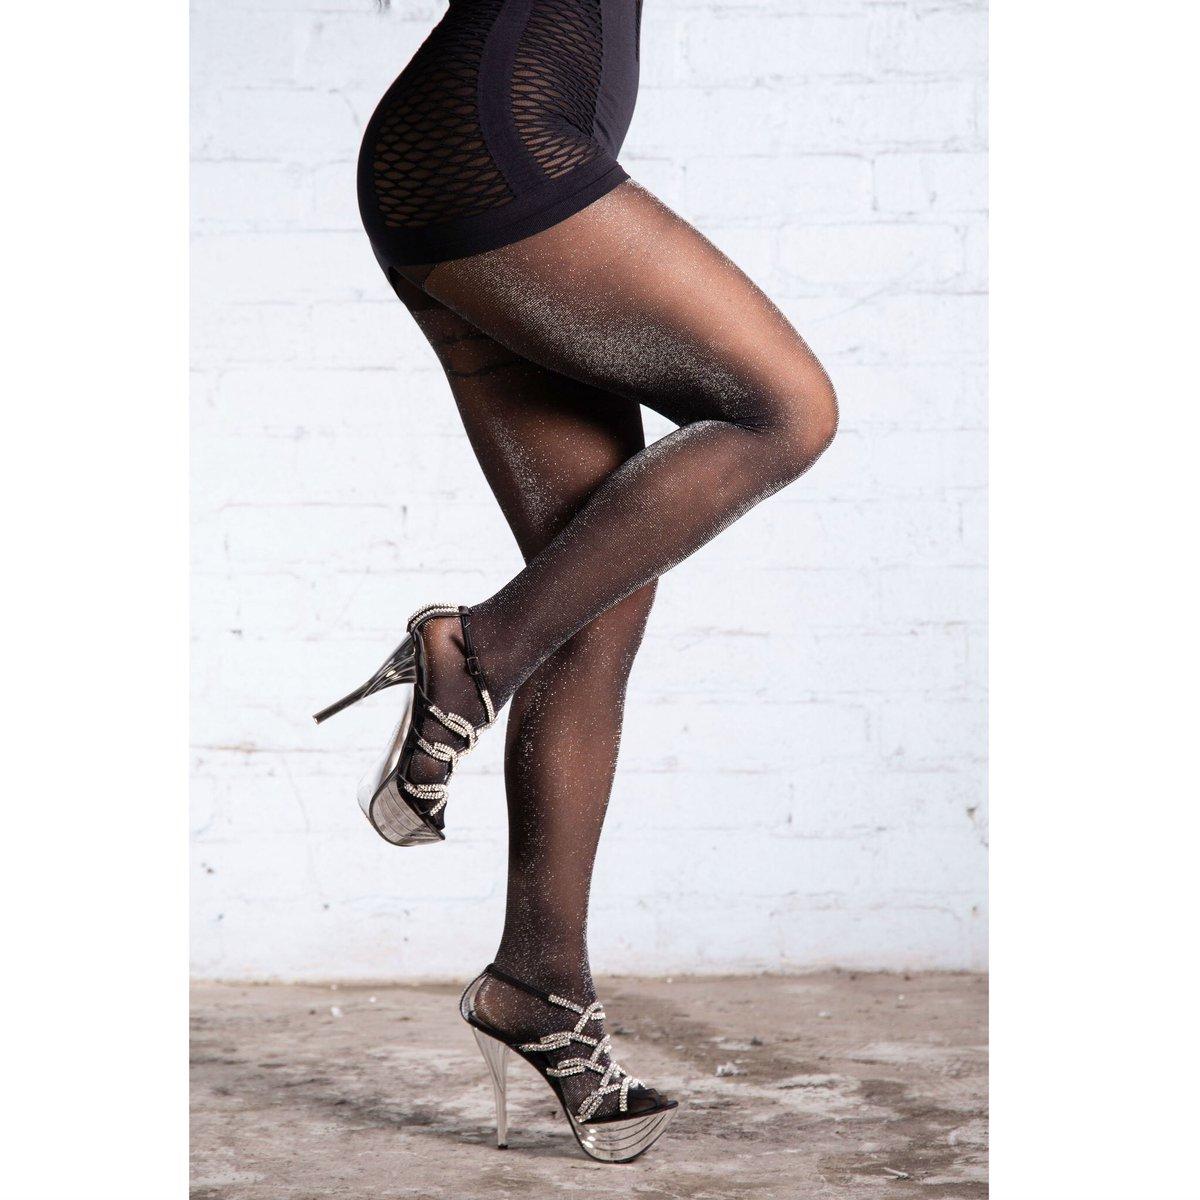 61ff61d603fc3 Very glittery black-silver glitter tights. #glittertights #glitterpantyhose  #glitterytights #glitterypantyhose #sparkletights #sparklepantyhose  #lurextights ...